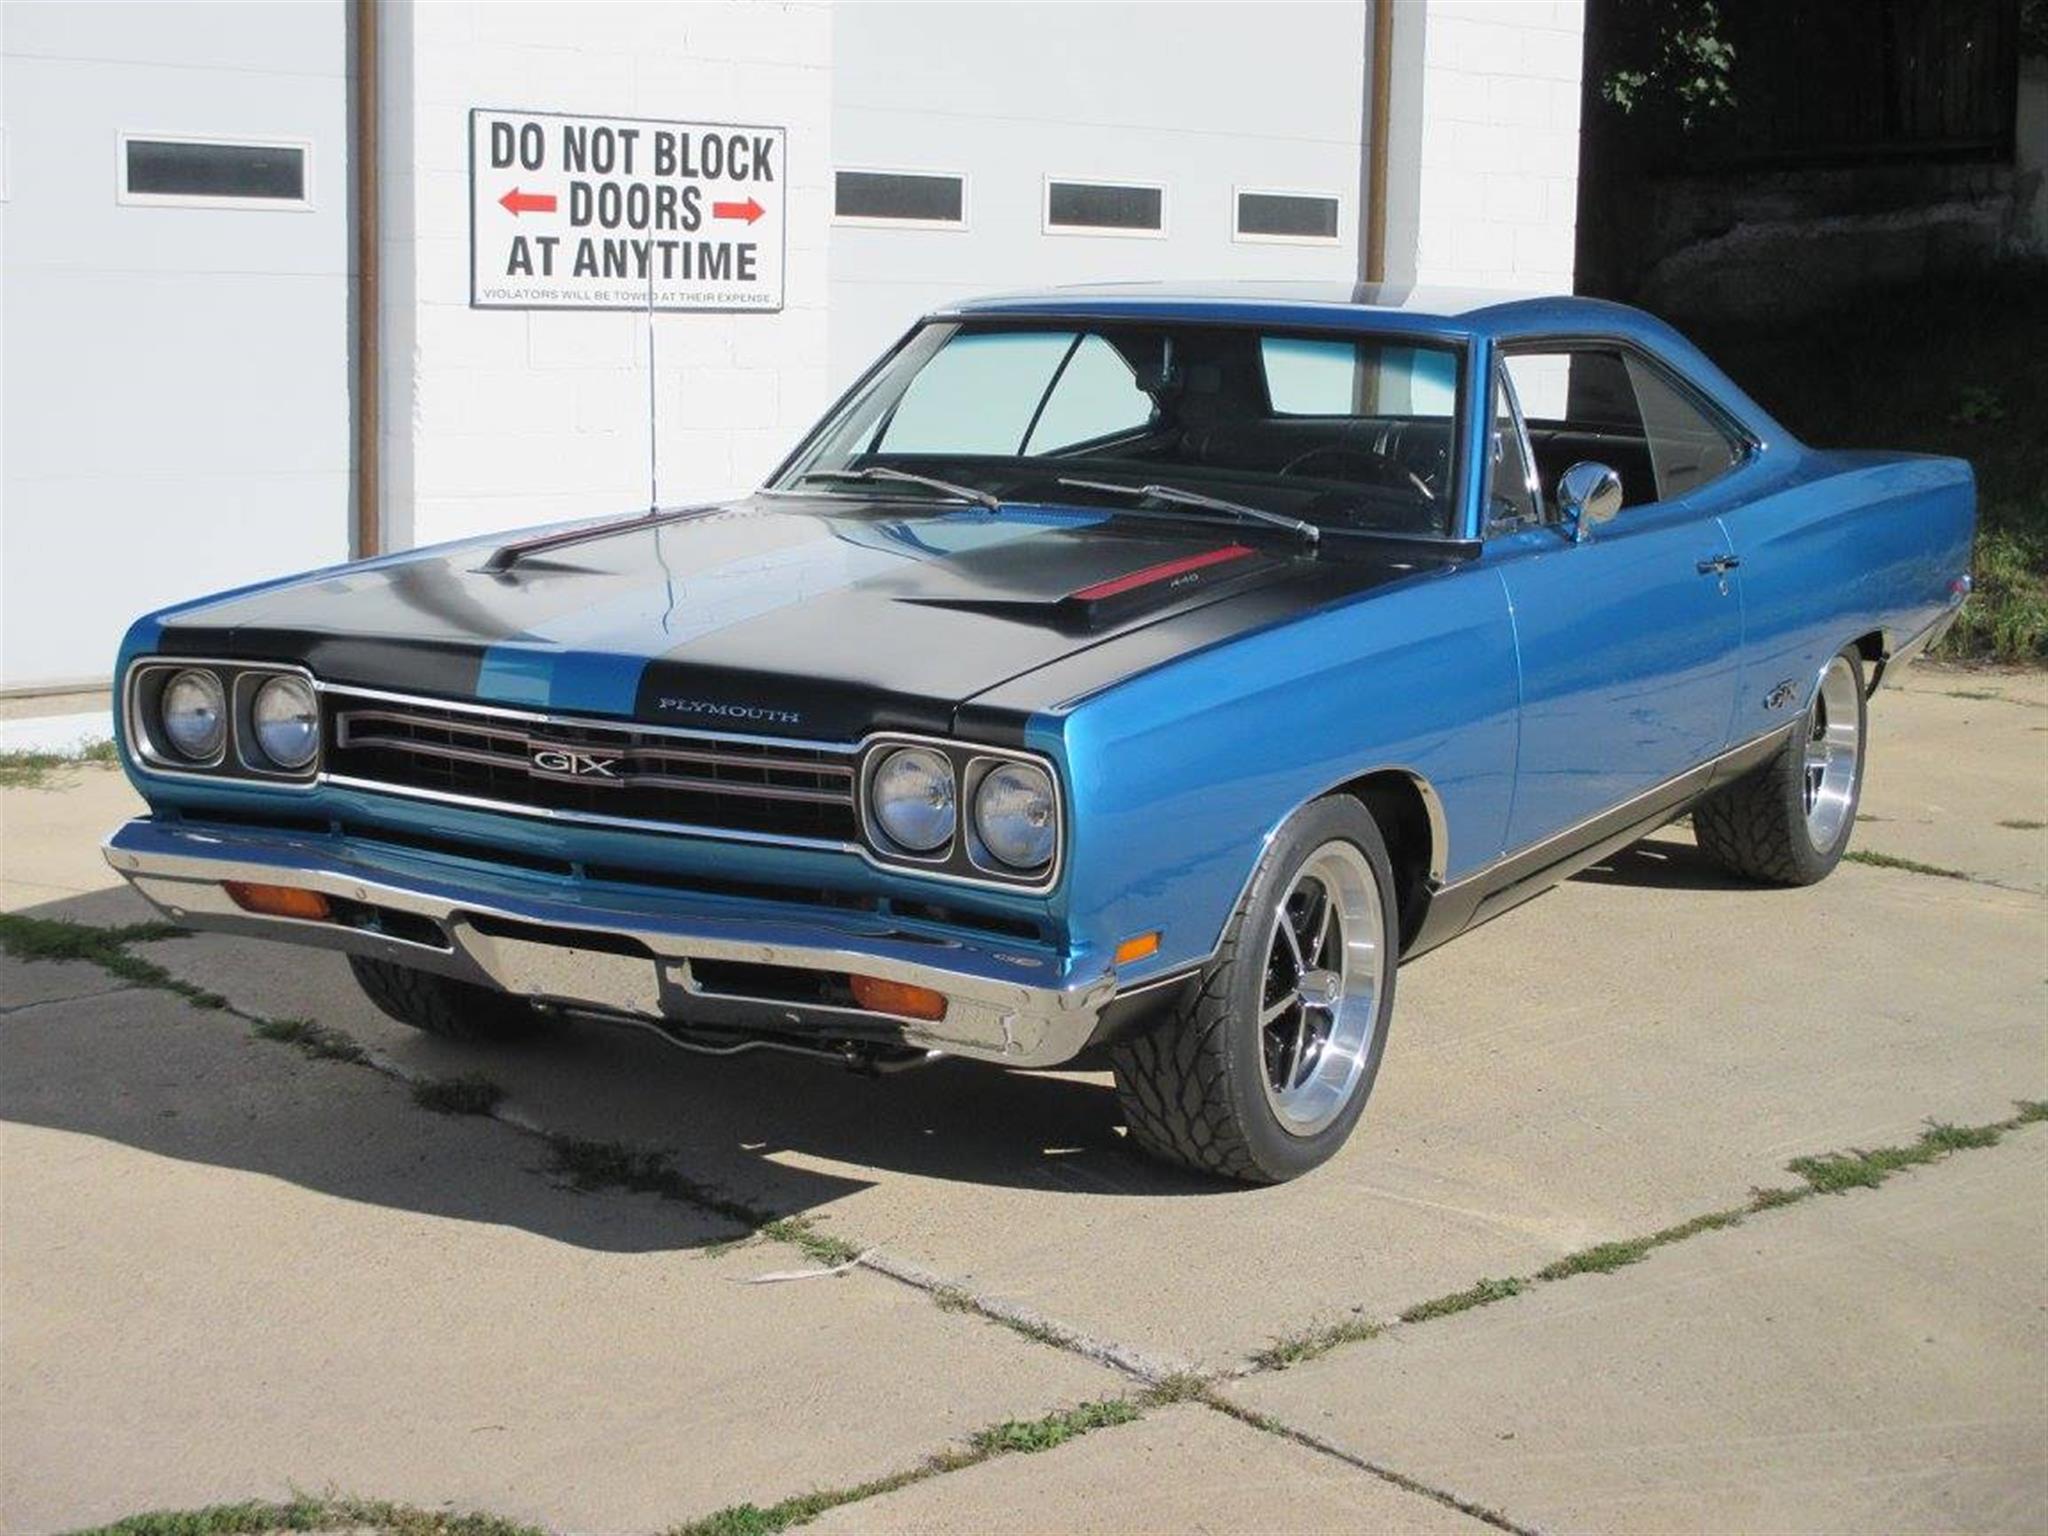 Plymouth - GTX - 1969 - Wheels & Tires - Paint -  Wraps & Body - Lighting - Interior - Performance